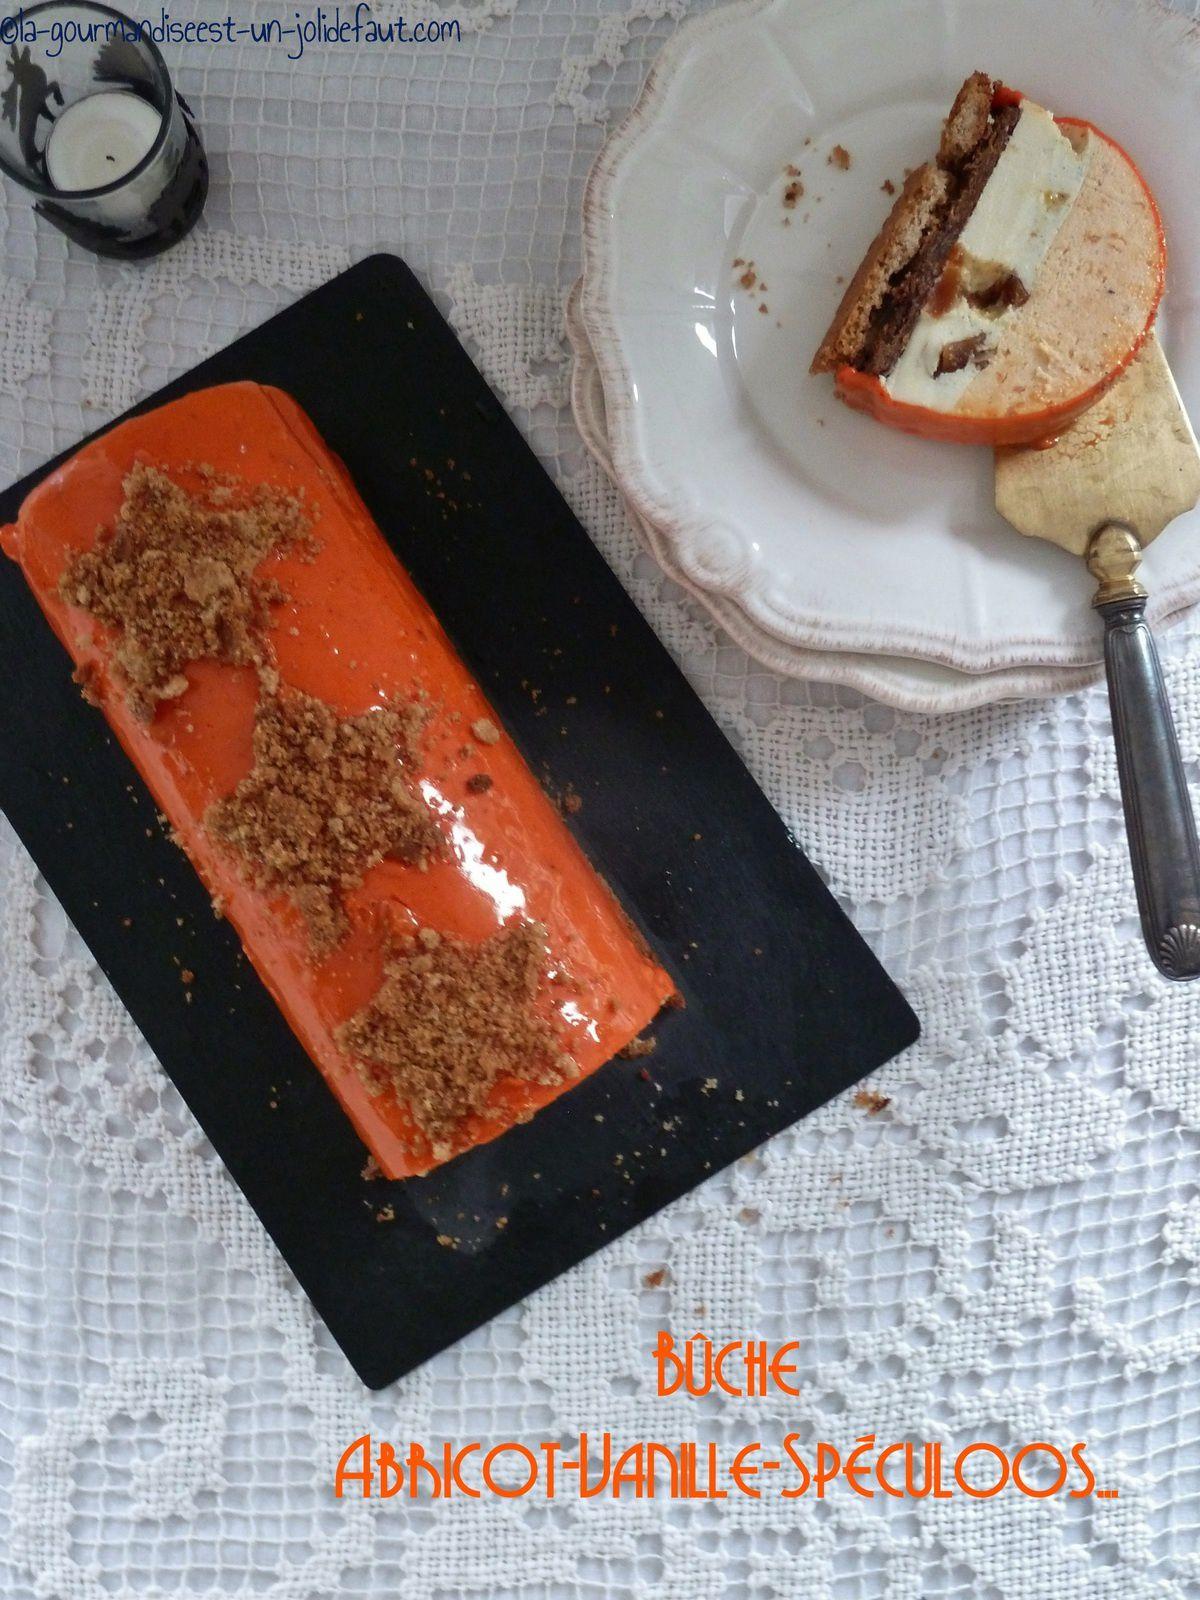 Bûche abricot-vanille-spéculoos